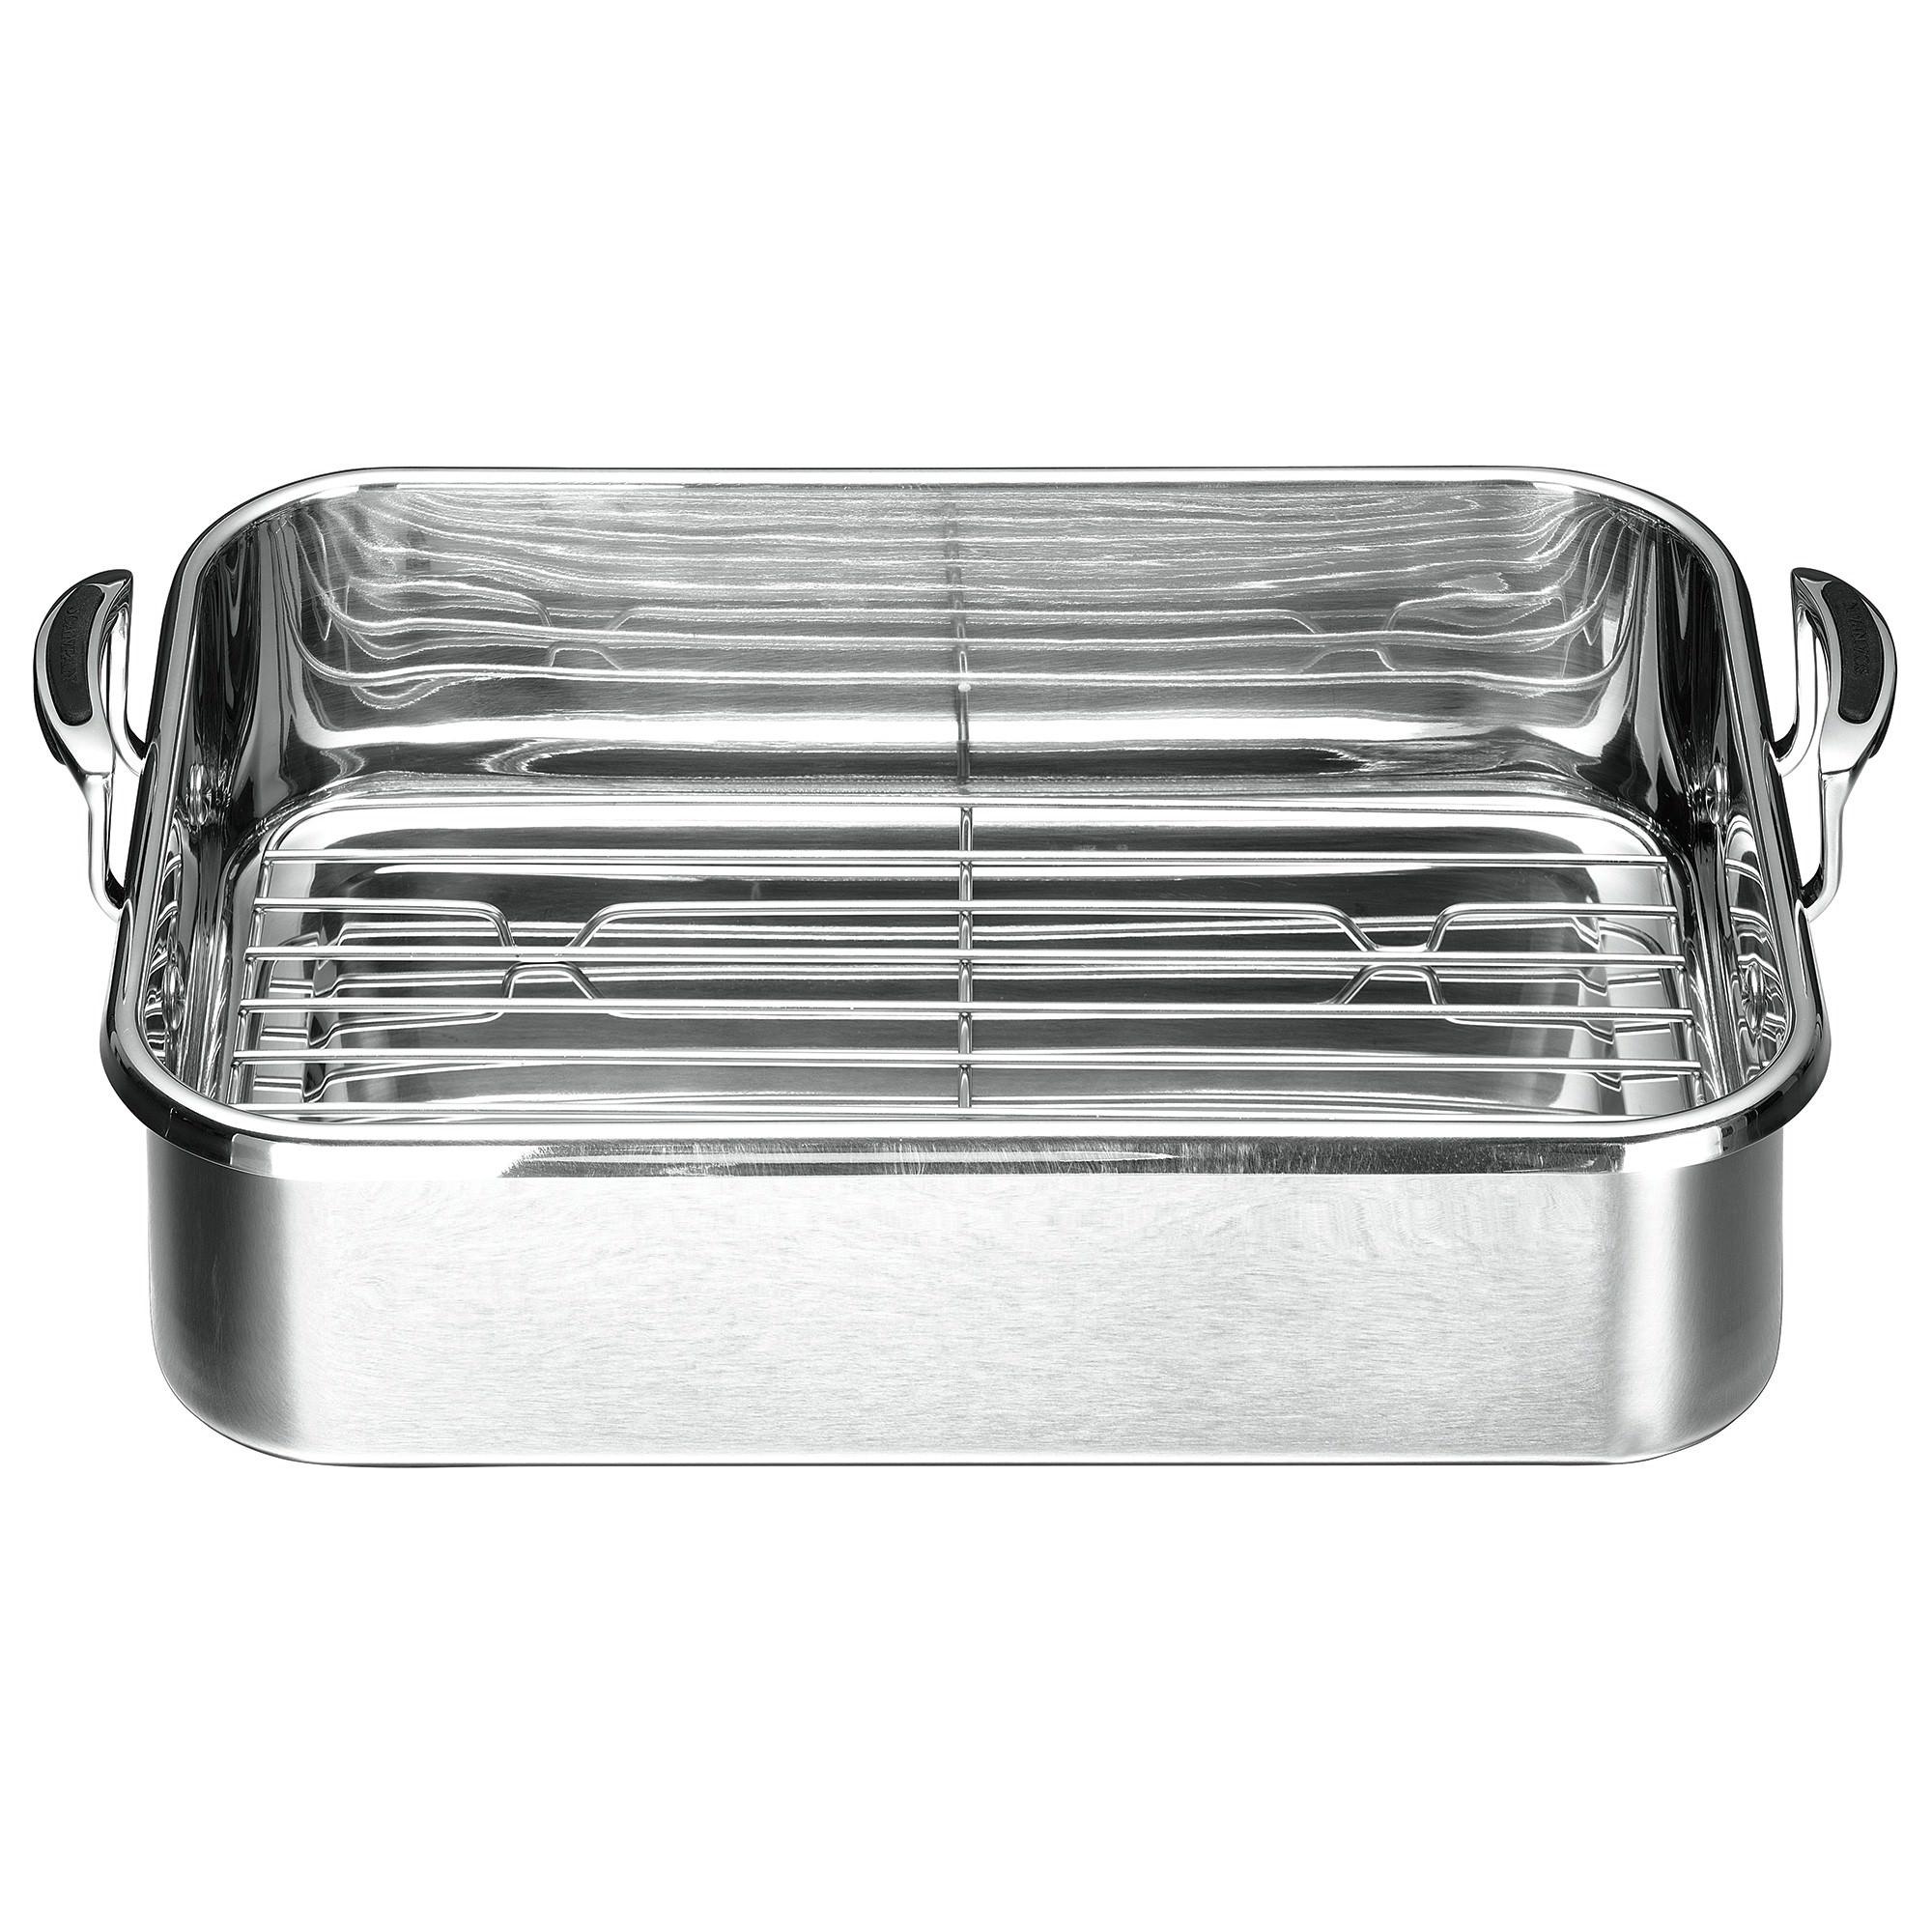 Scanpan Coppernox Roasting Pan with Rack, 40x29cm